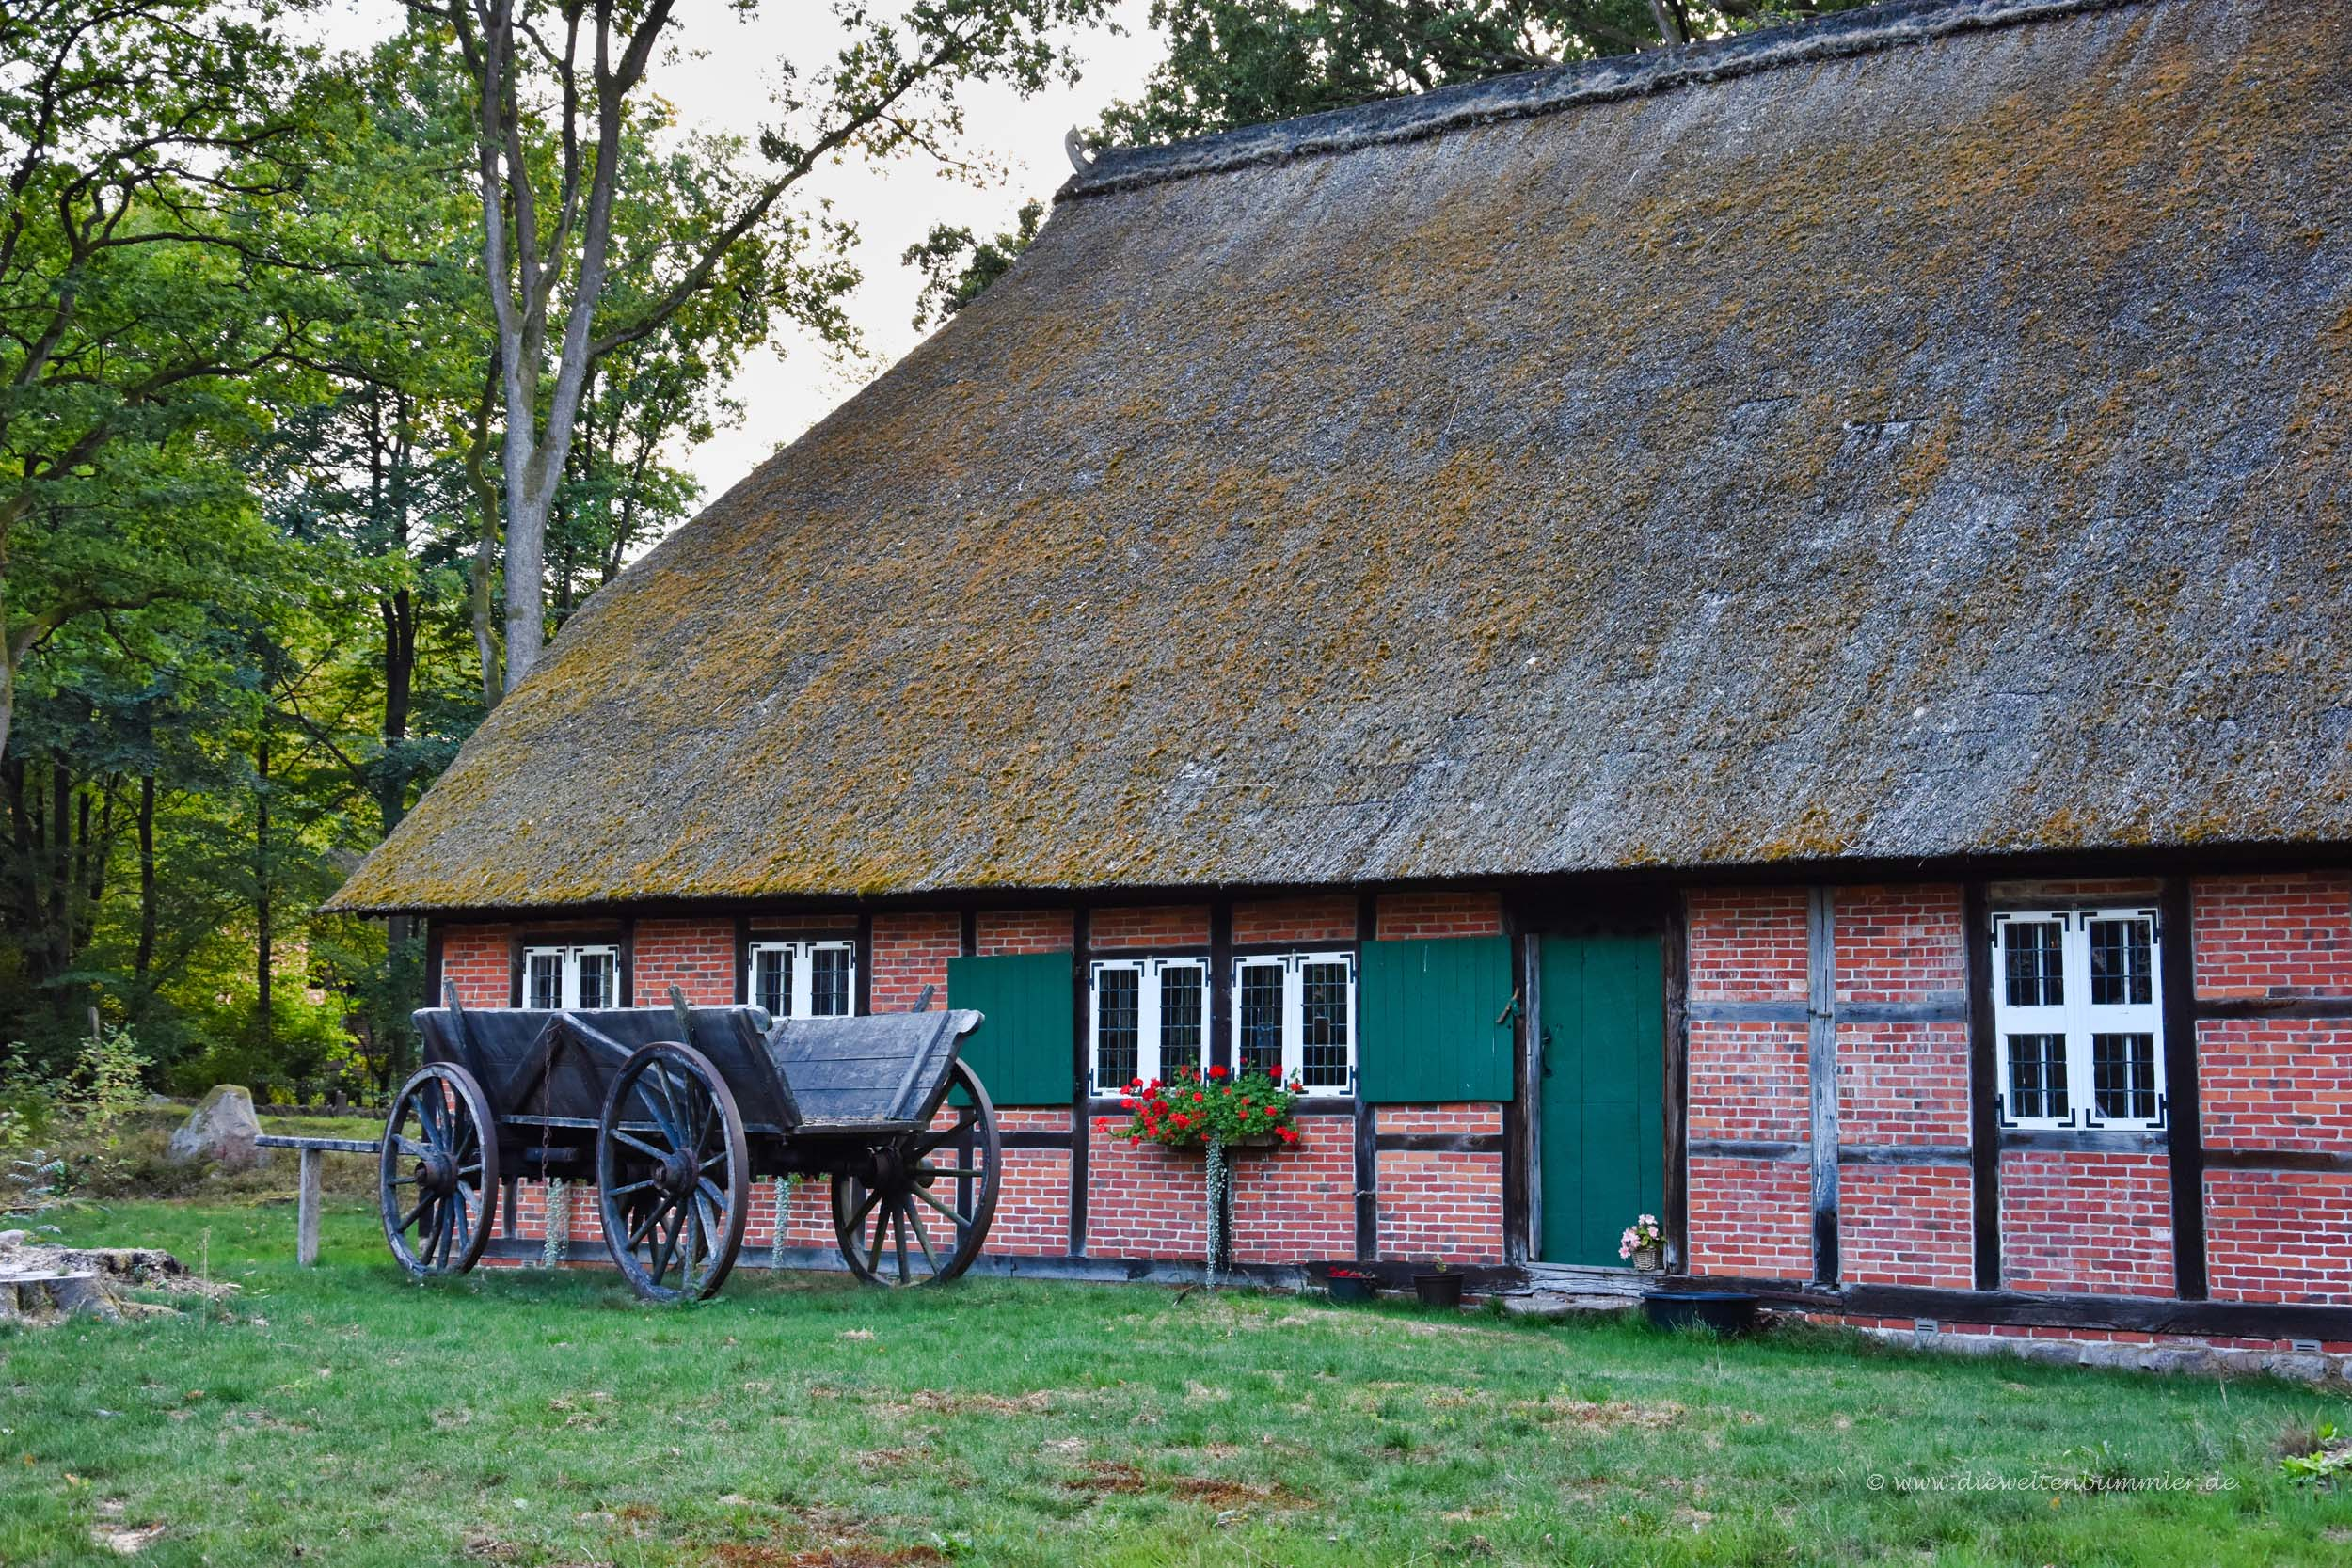 Fachwerkhaus mit Reetdach in Wilsede